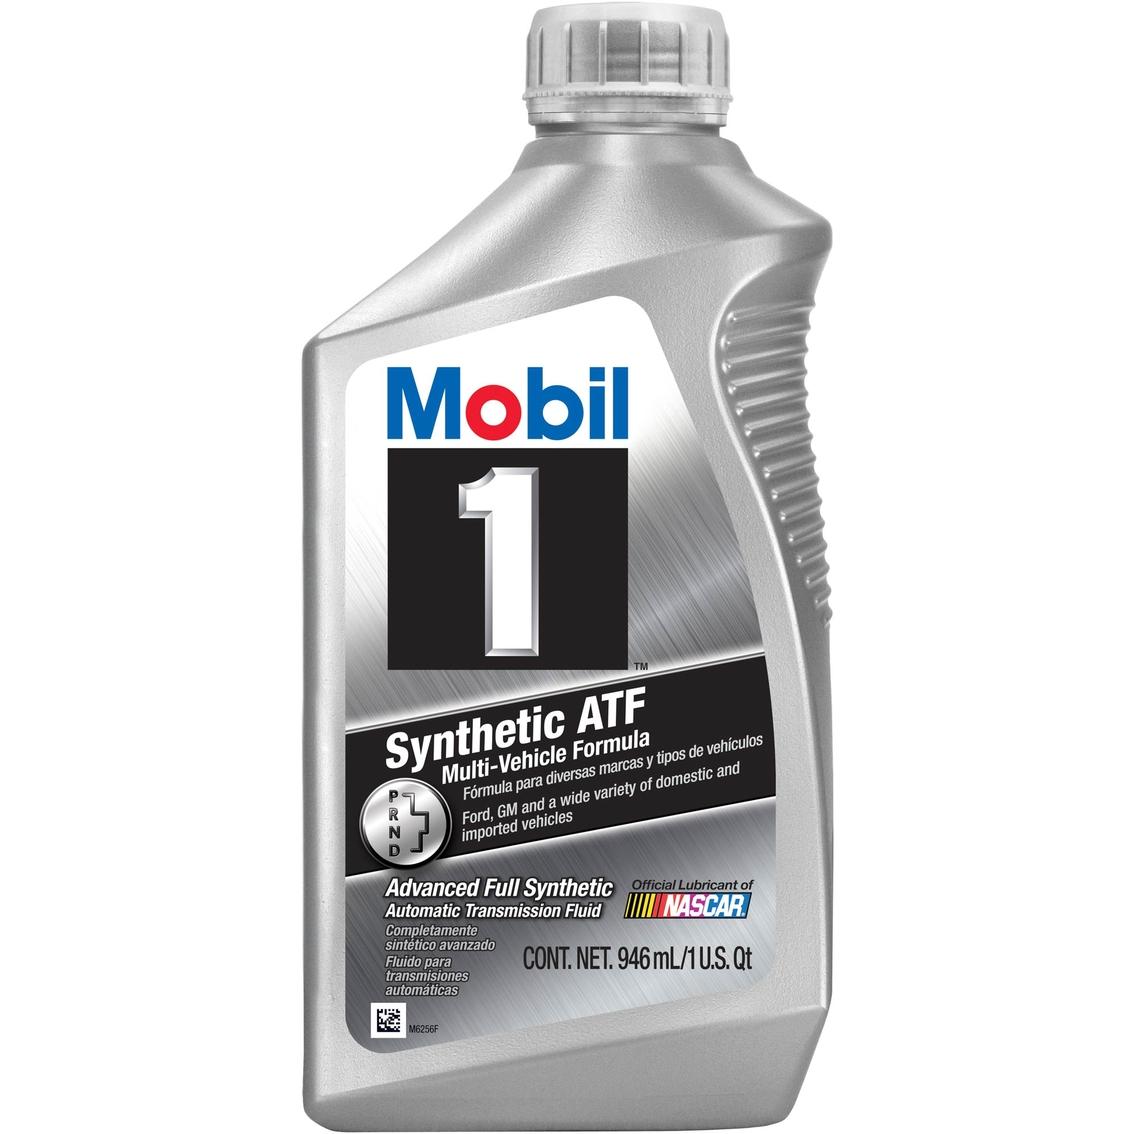 Mobilfluid Automatic Transmission Fluid : Mobil synthetic atf automatic transmission fluid qt